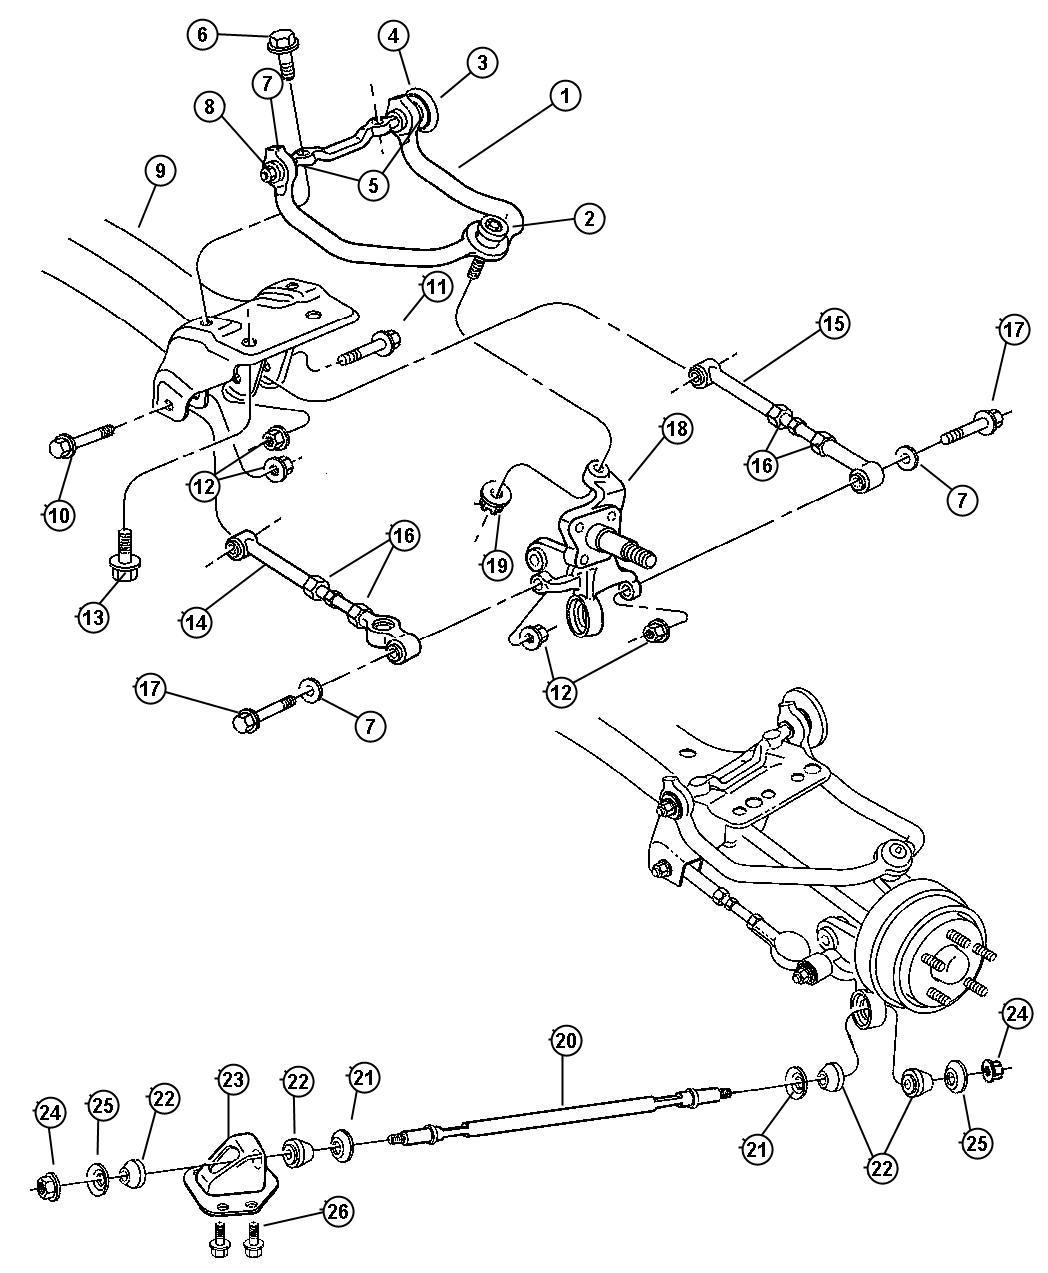 1998 Dodge Avenger Link. Rear lateral. Suspension, brakes